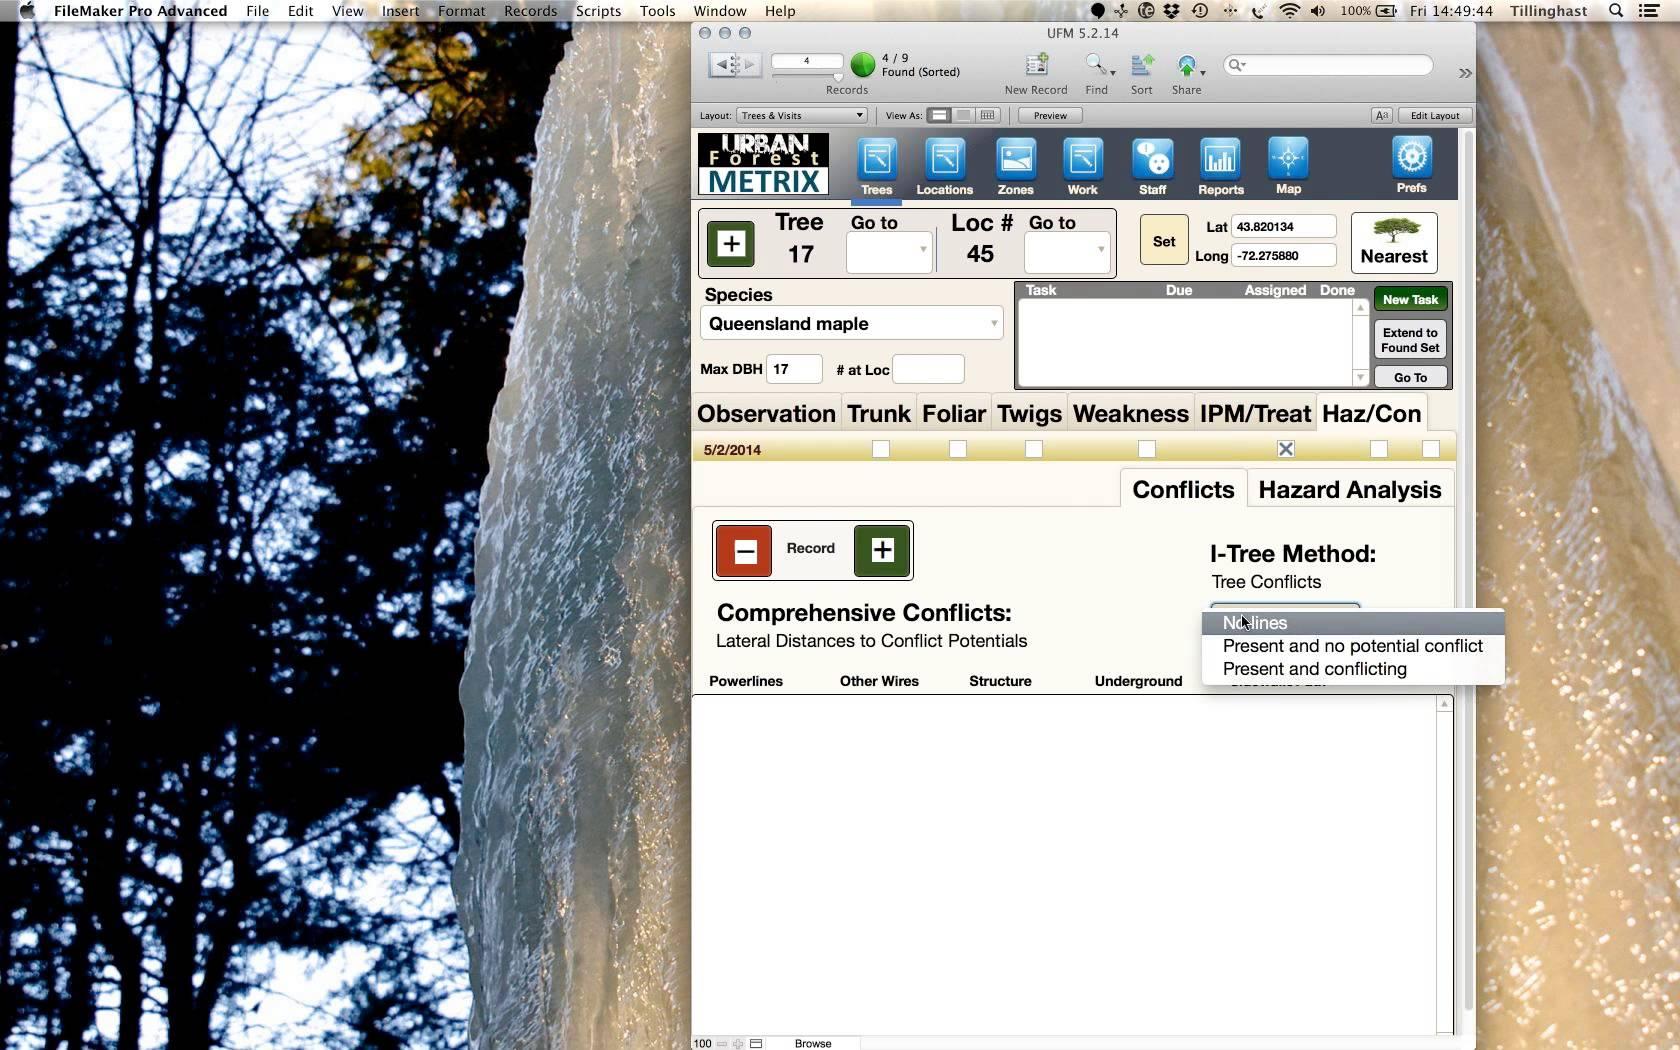 Forest Metrix enables users to undertake hazard analysis